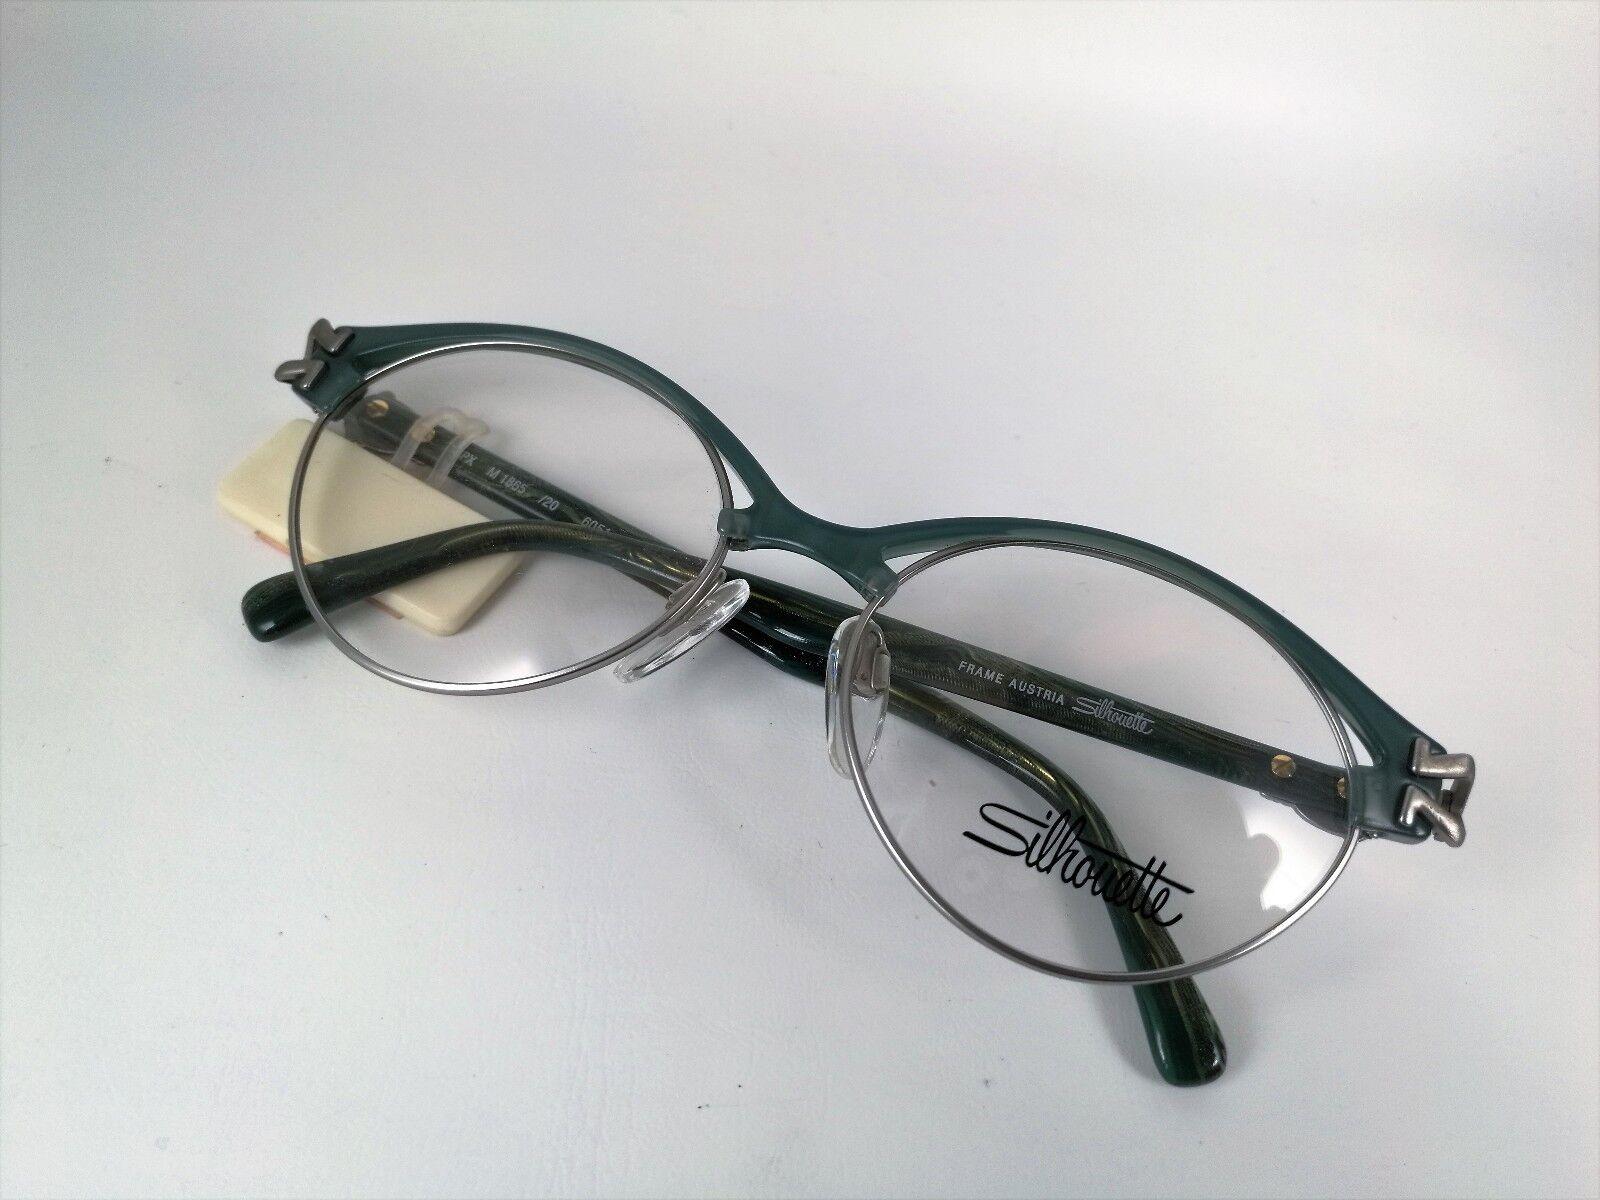 SILHOUETTE Brille M1865 20-6051 Vintage Vintage Vintage Frame Crazy Eyeglasses Classic 80s Style 758648